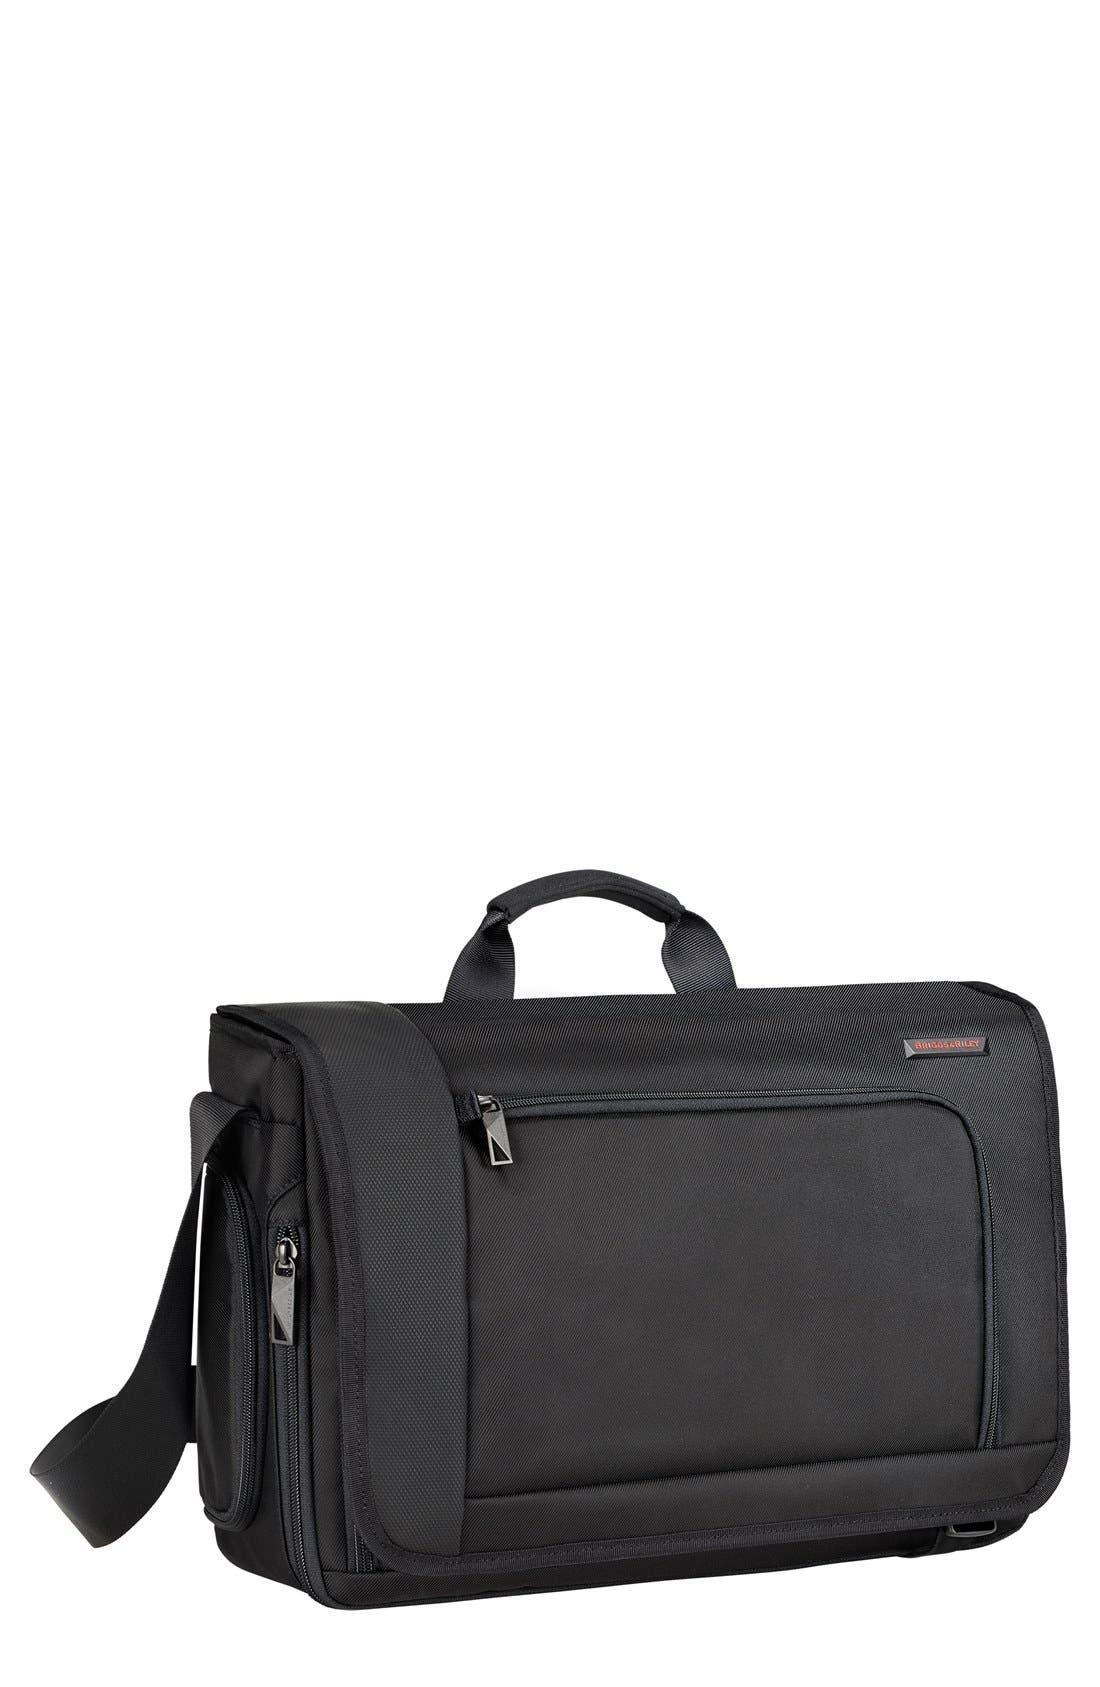 BRIGGS & RILEY 'Verb - Dispatch' Messenger Bag